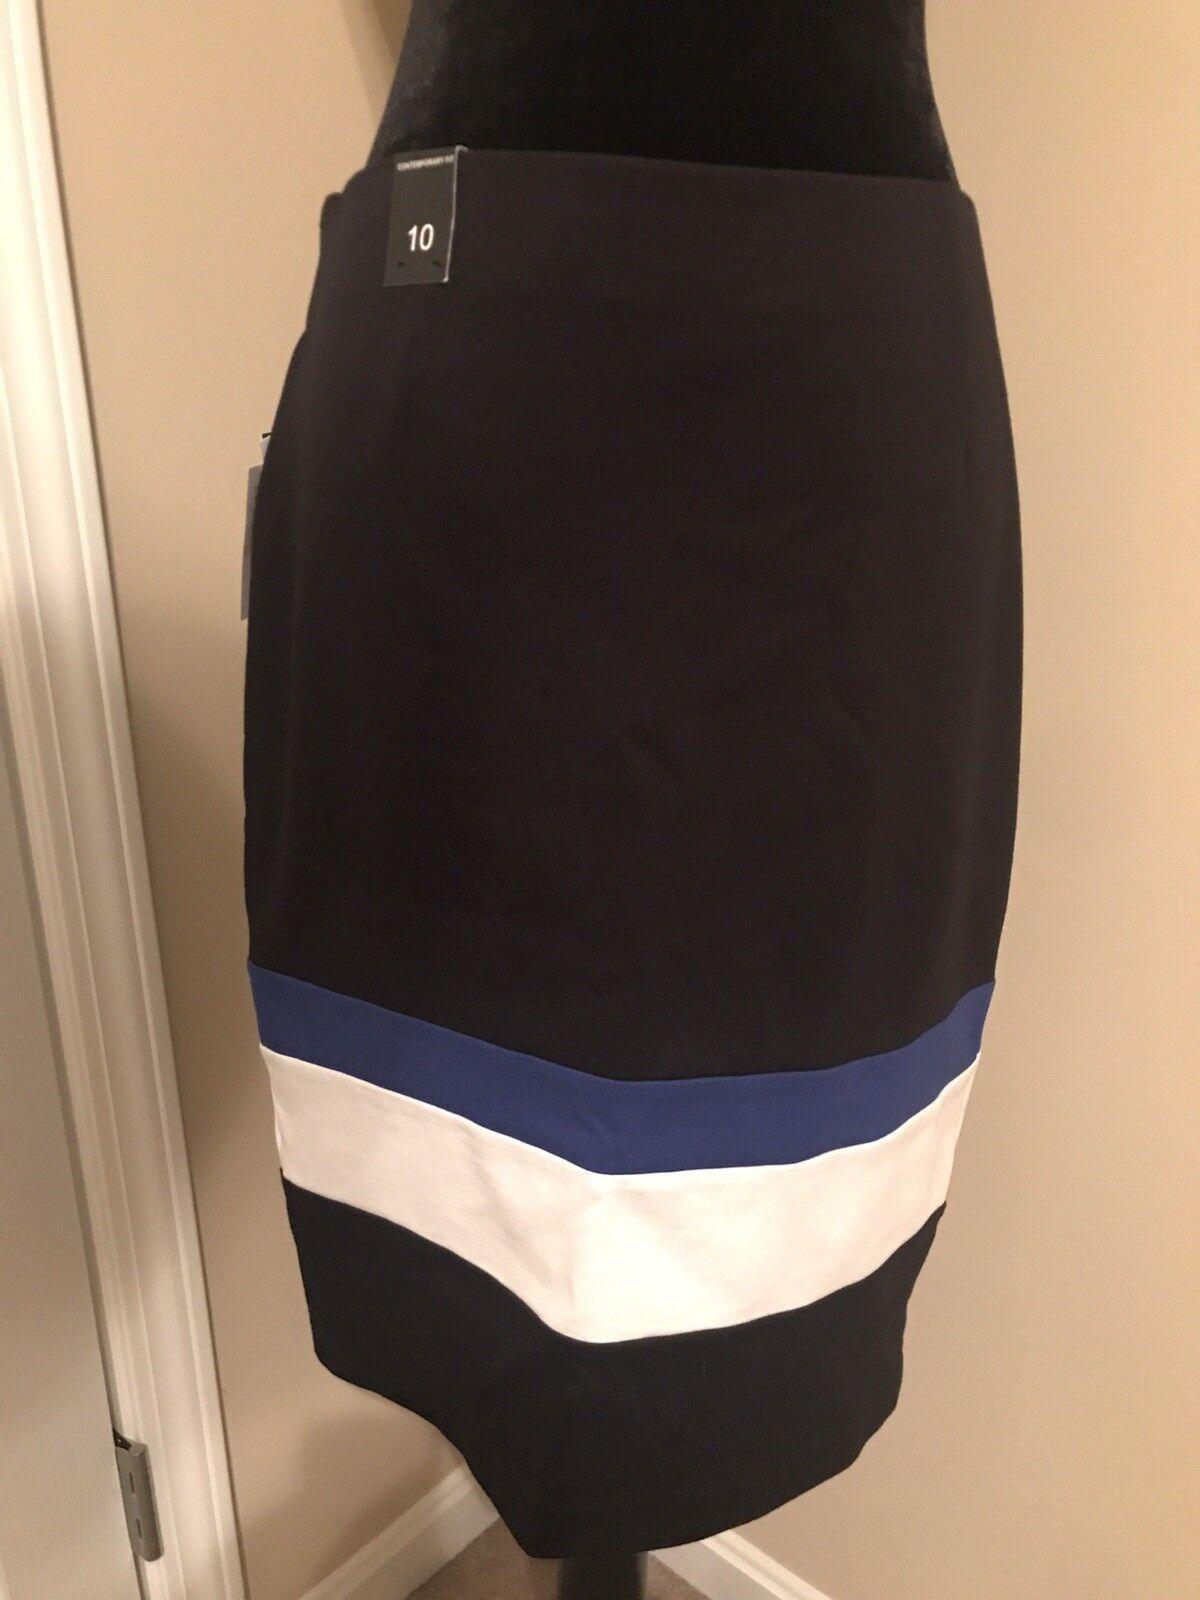 NWT  98 Amanda + Chelsea Skirt 10 Stretch Multi-color color.